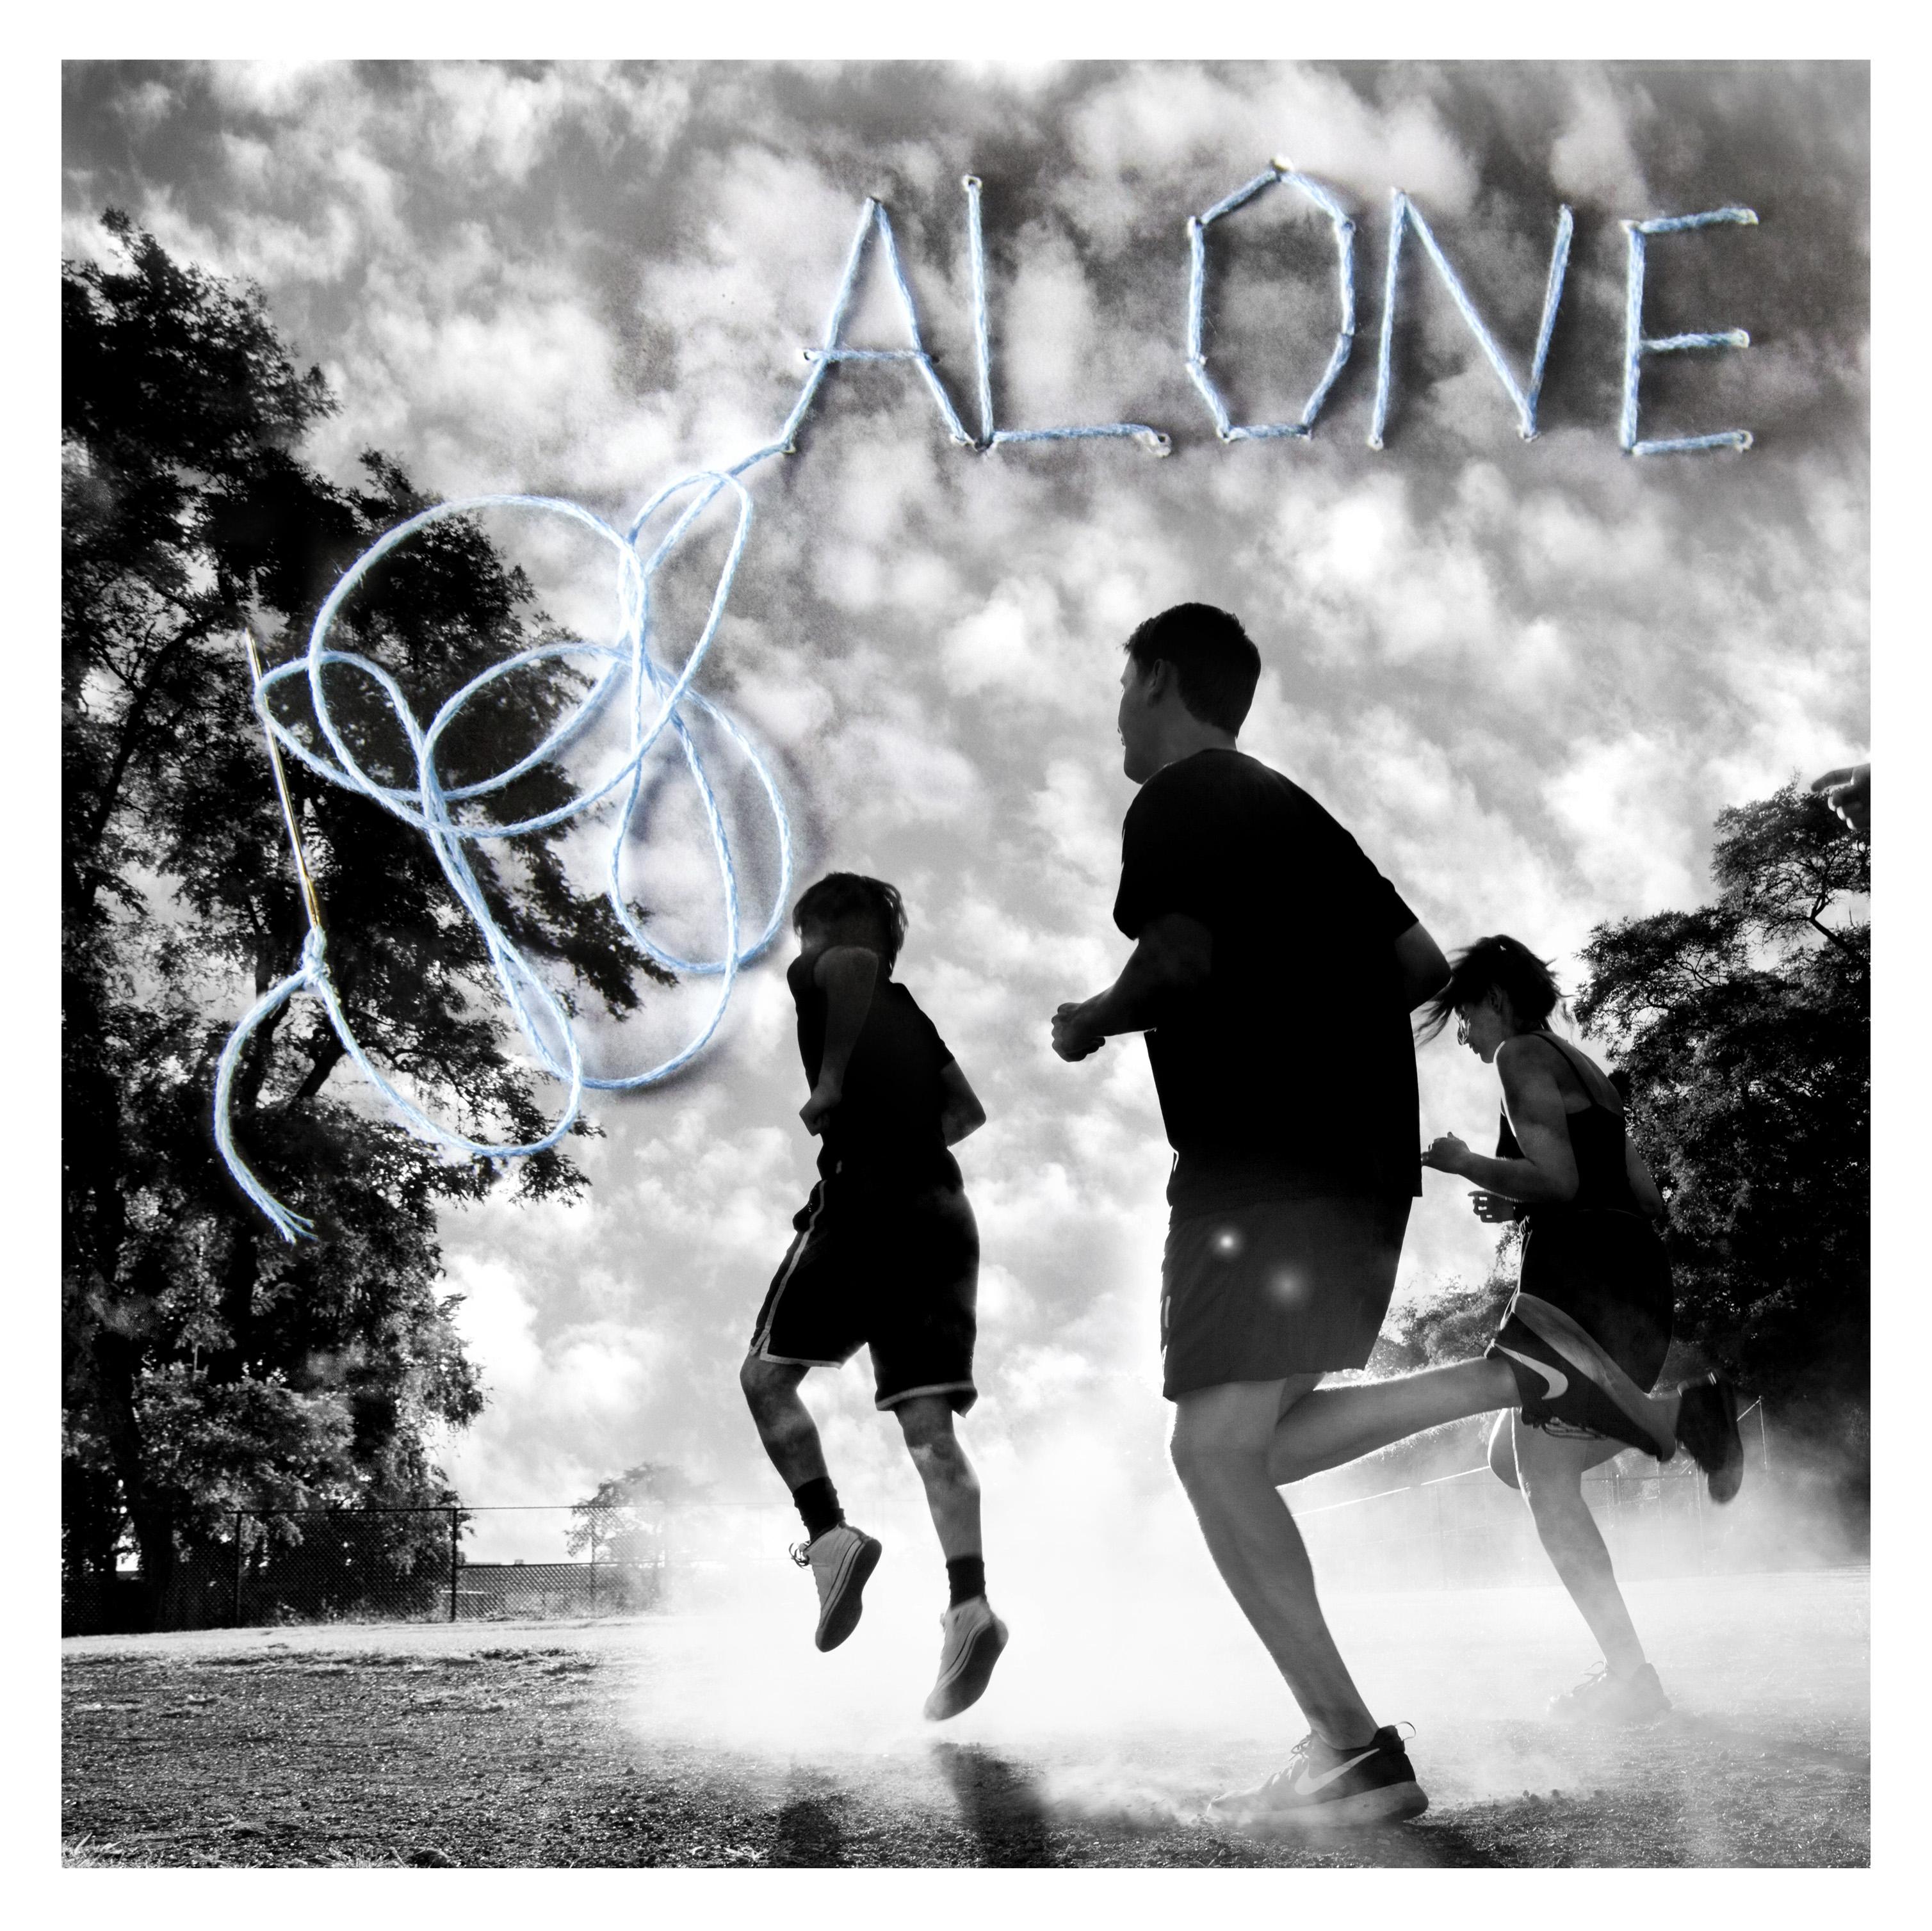 Alone 7